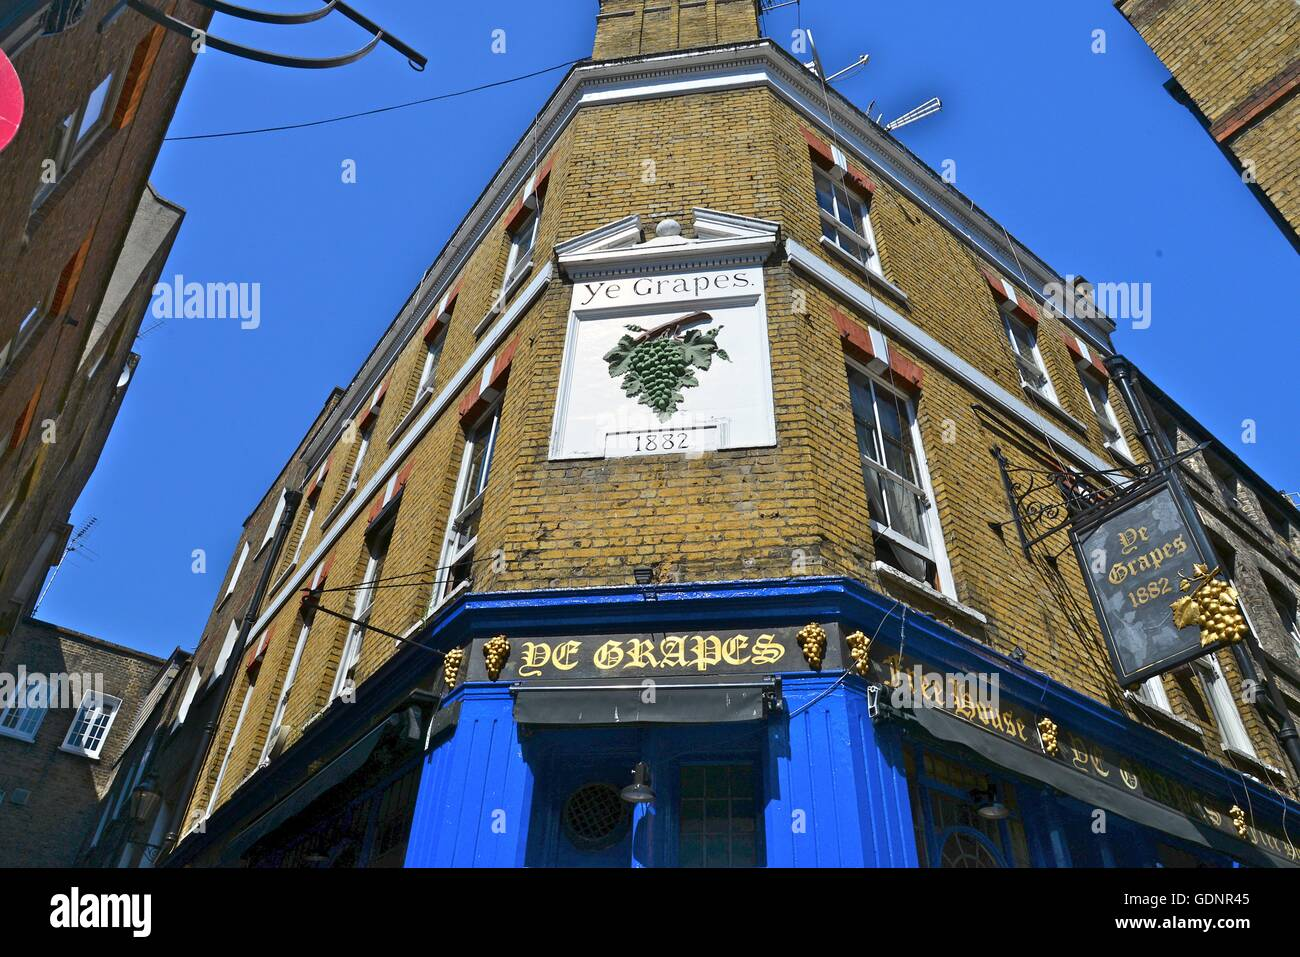 The Grapes pub, Shepherd Market, London, England, UK - Stock Image